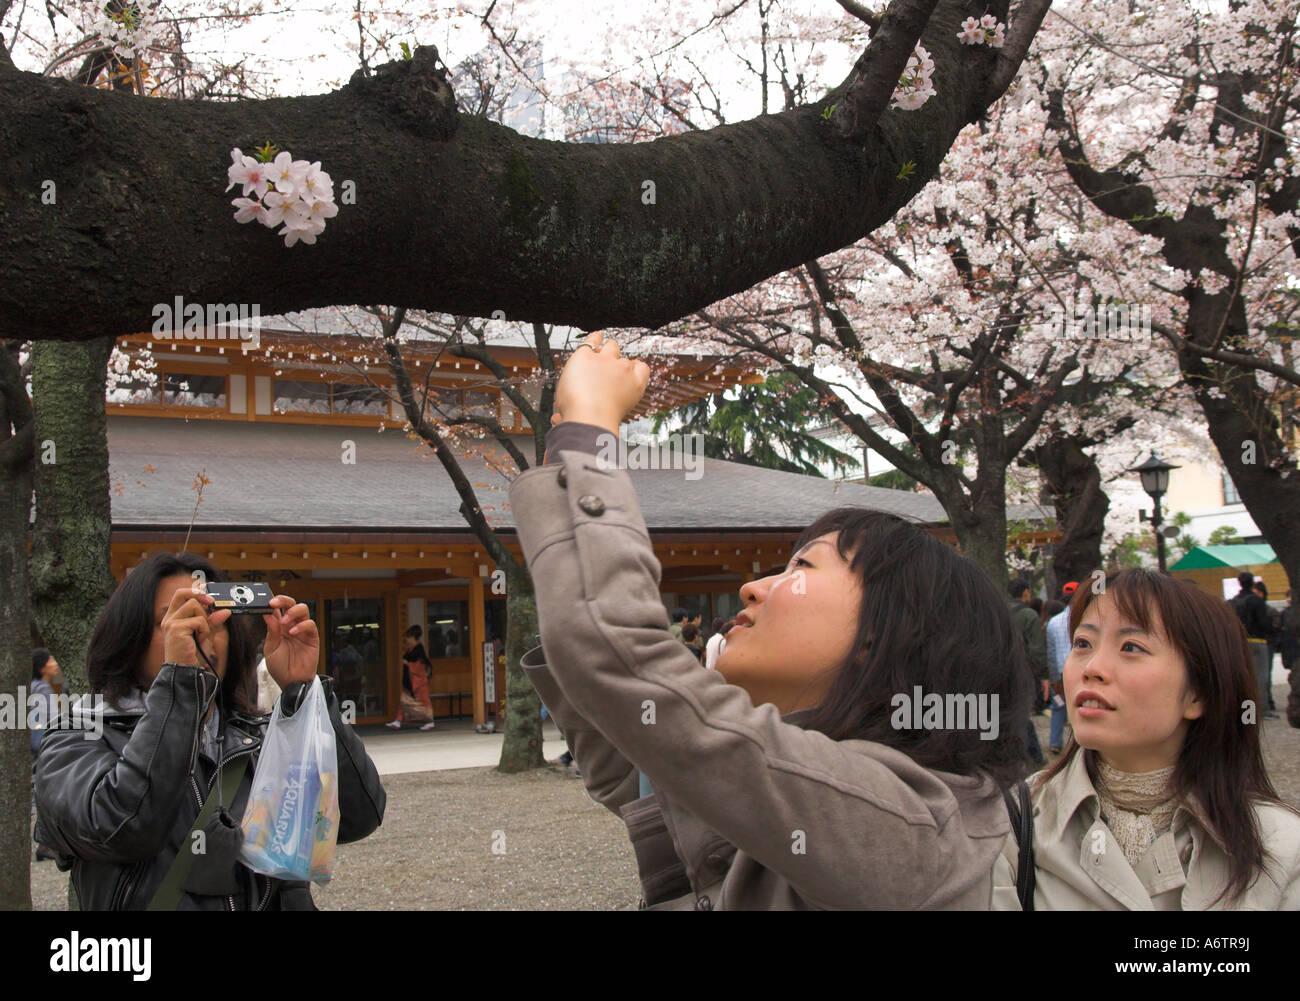 Japan Central Honshu Tokyo Yasukuni jinja Sakura cherry blossom visitors talking photographs of cherry flowers - Stock Image